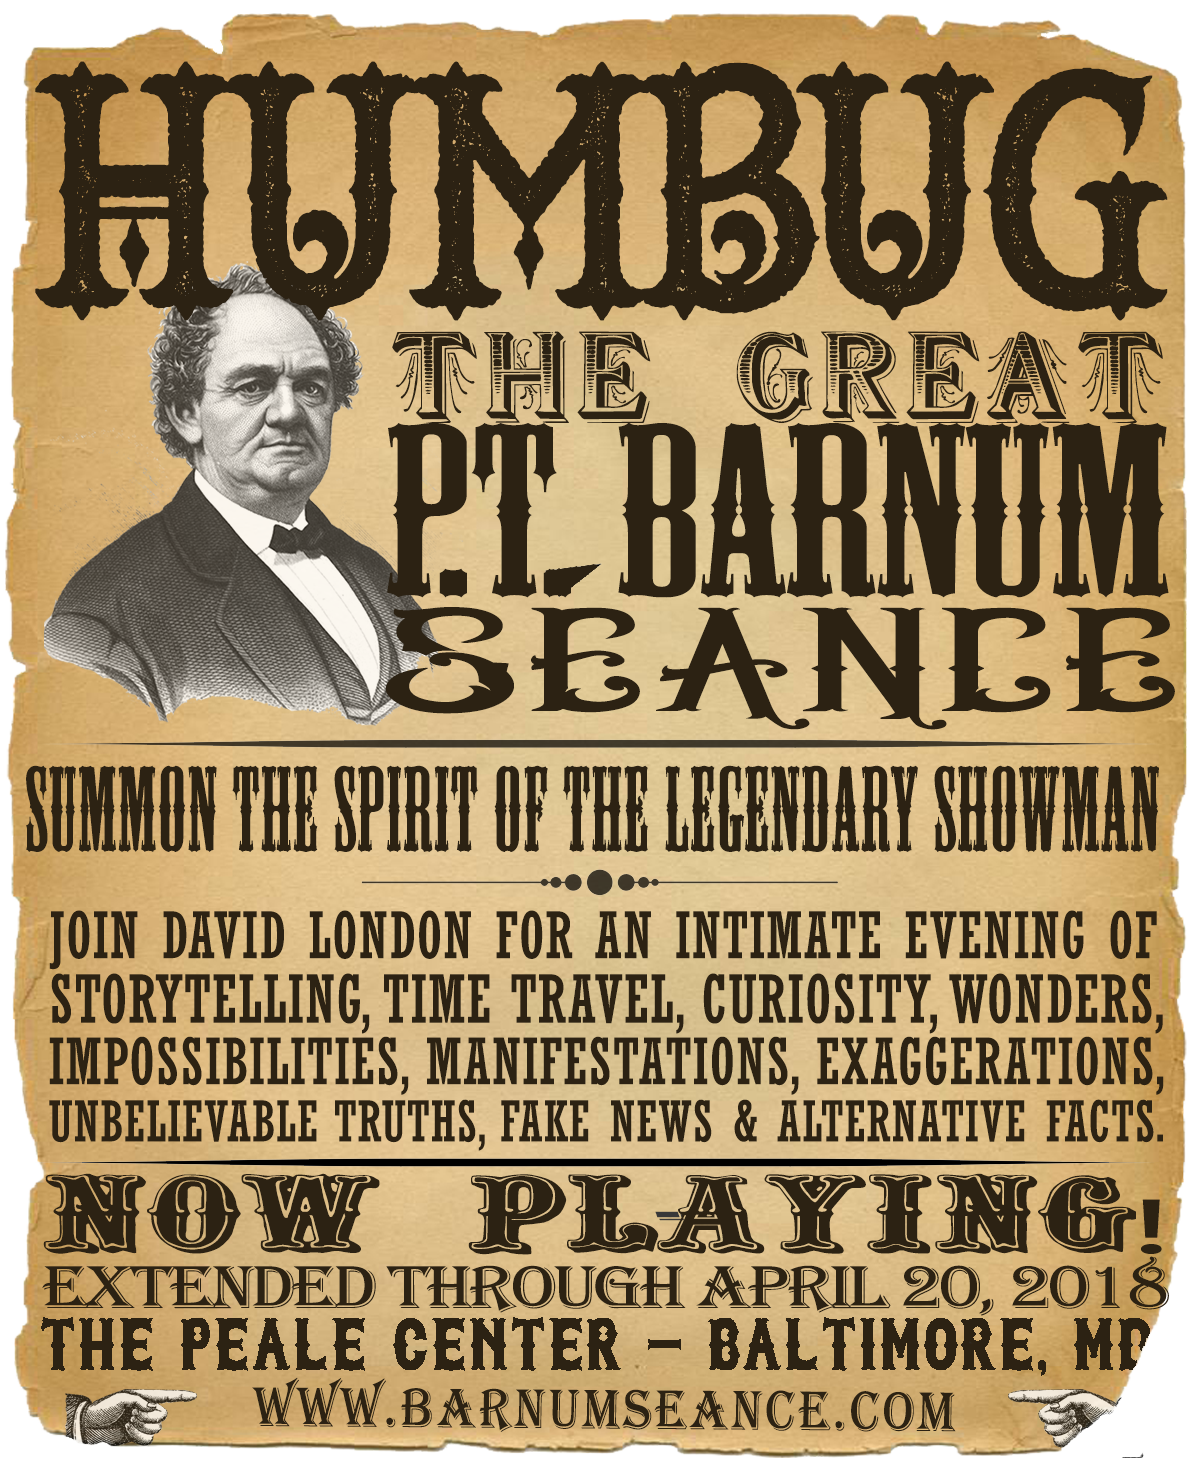 HUMBUG: The Great P.T. Barnum Seance